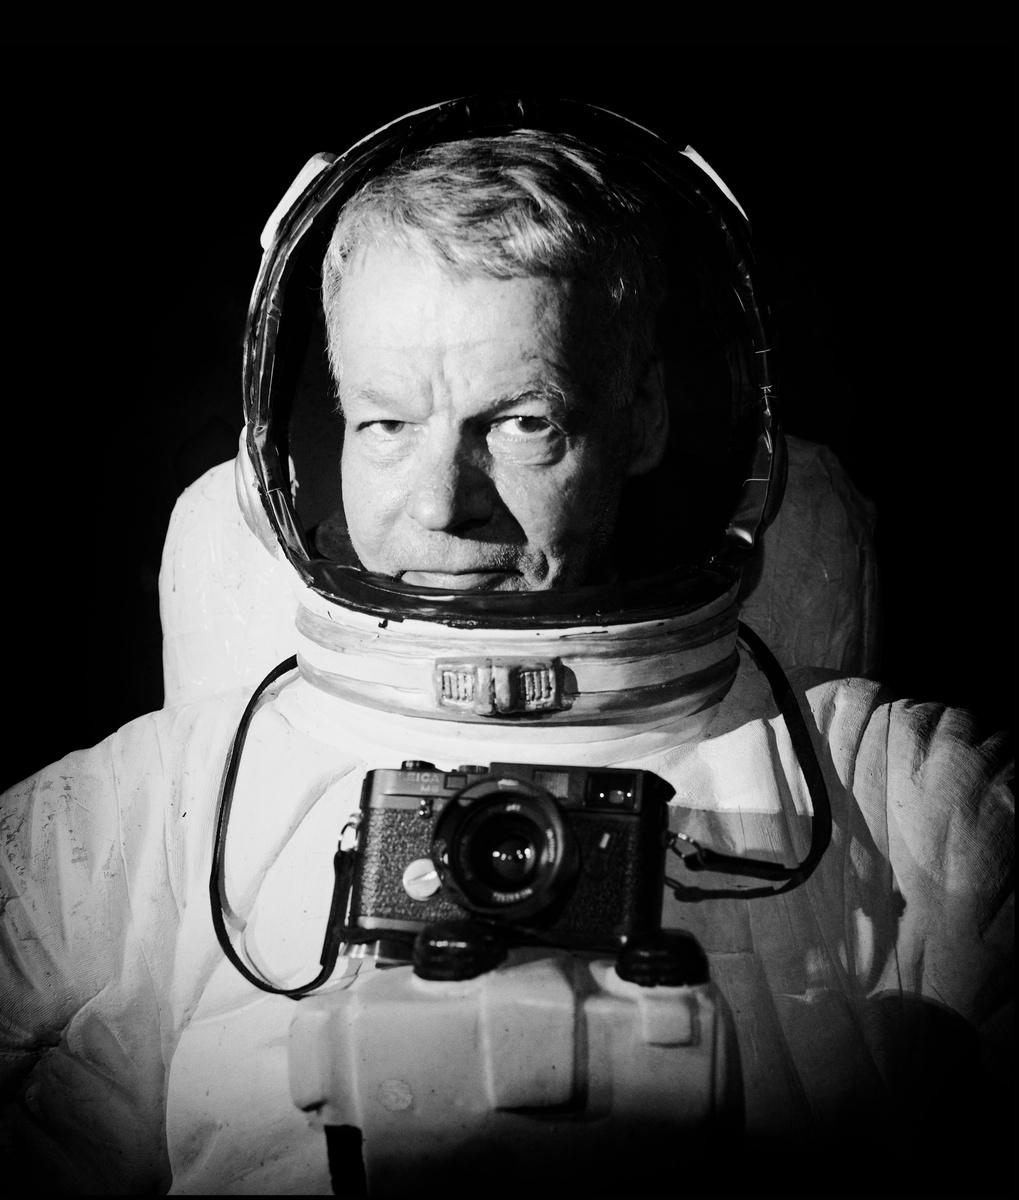 """Moon landing conspiracy: The worst lie"""